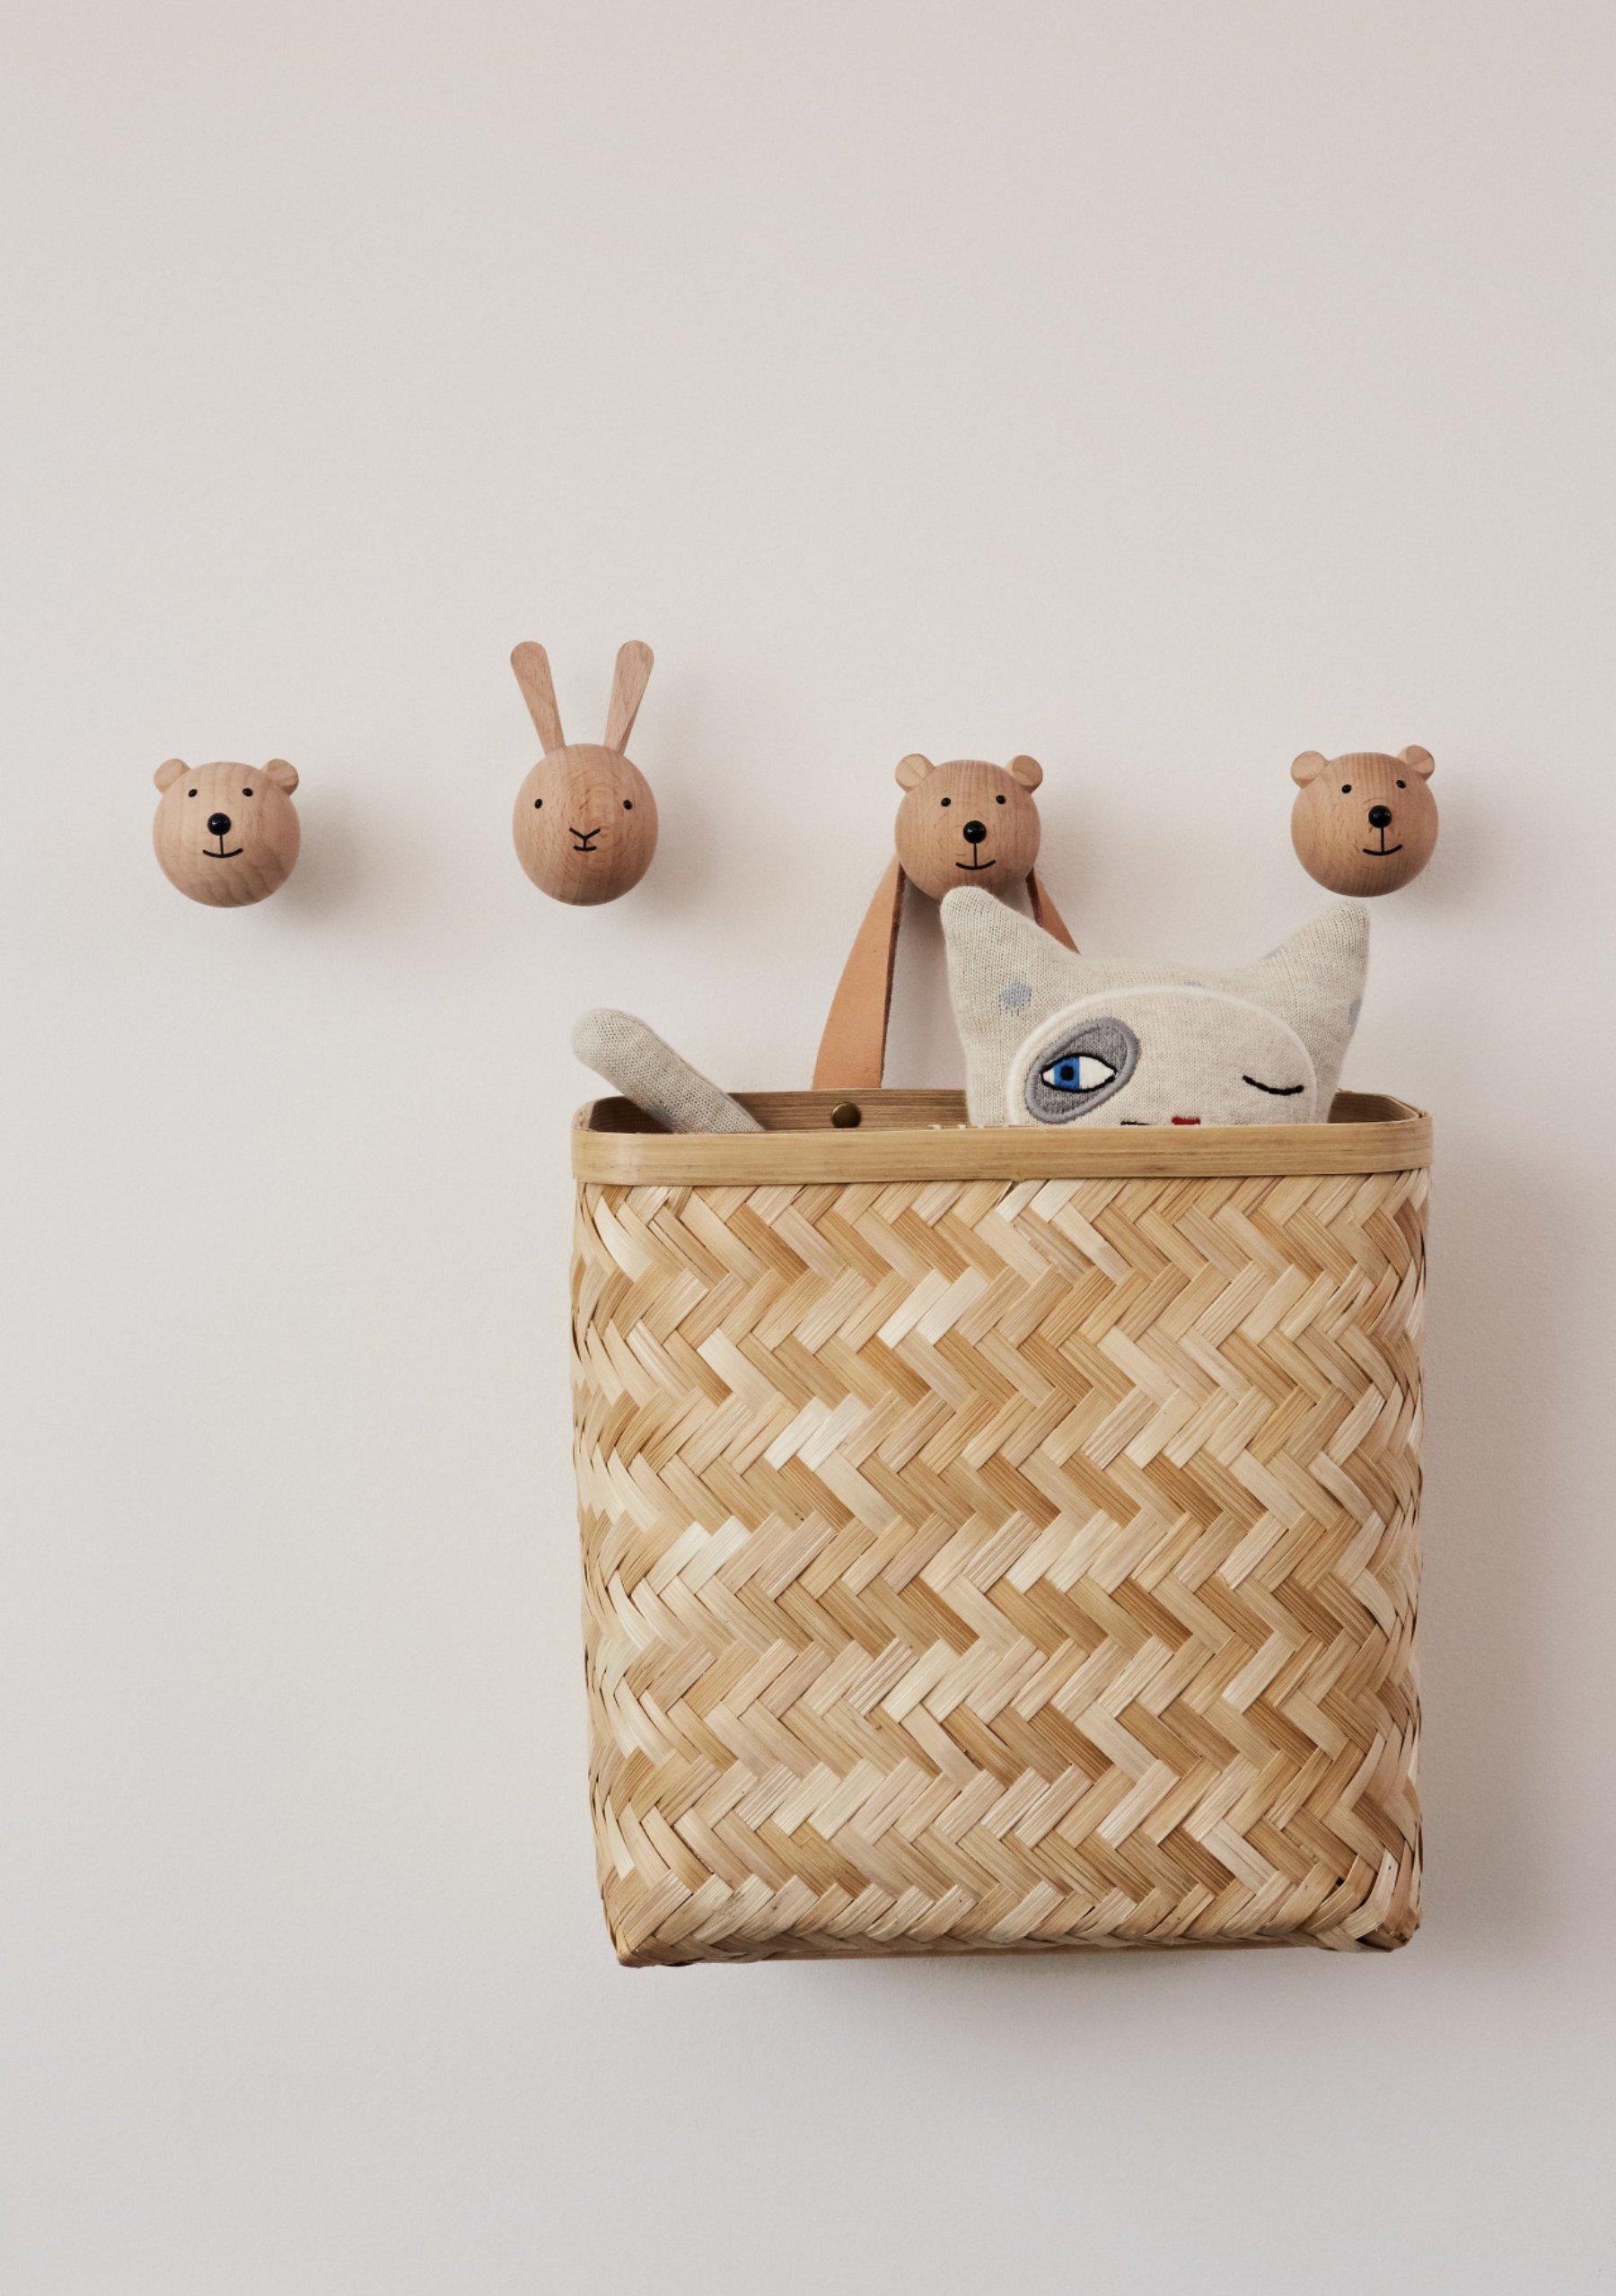 scandinavian feeling nursery decor kids wall hooks animals